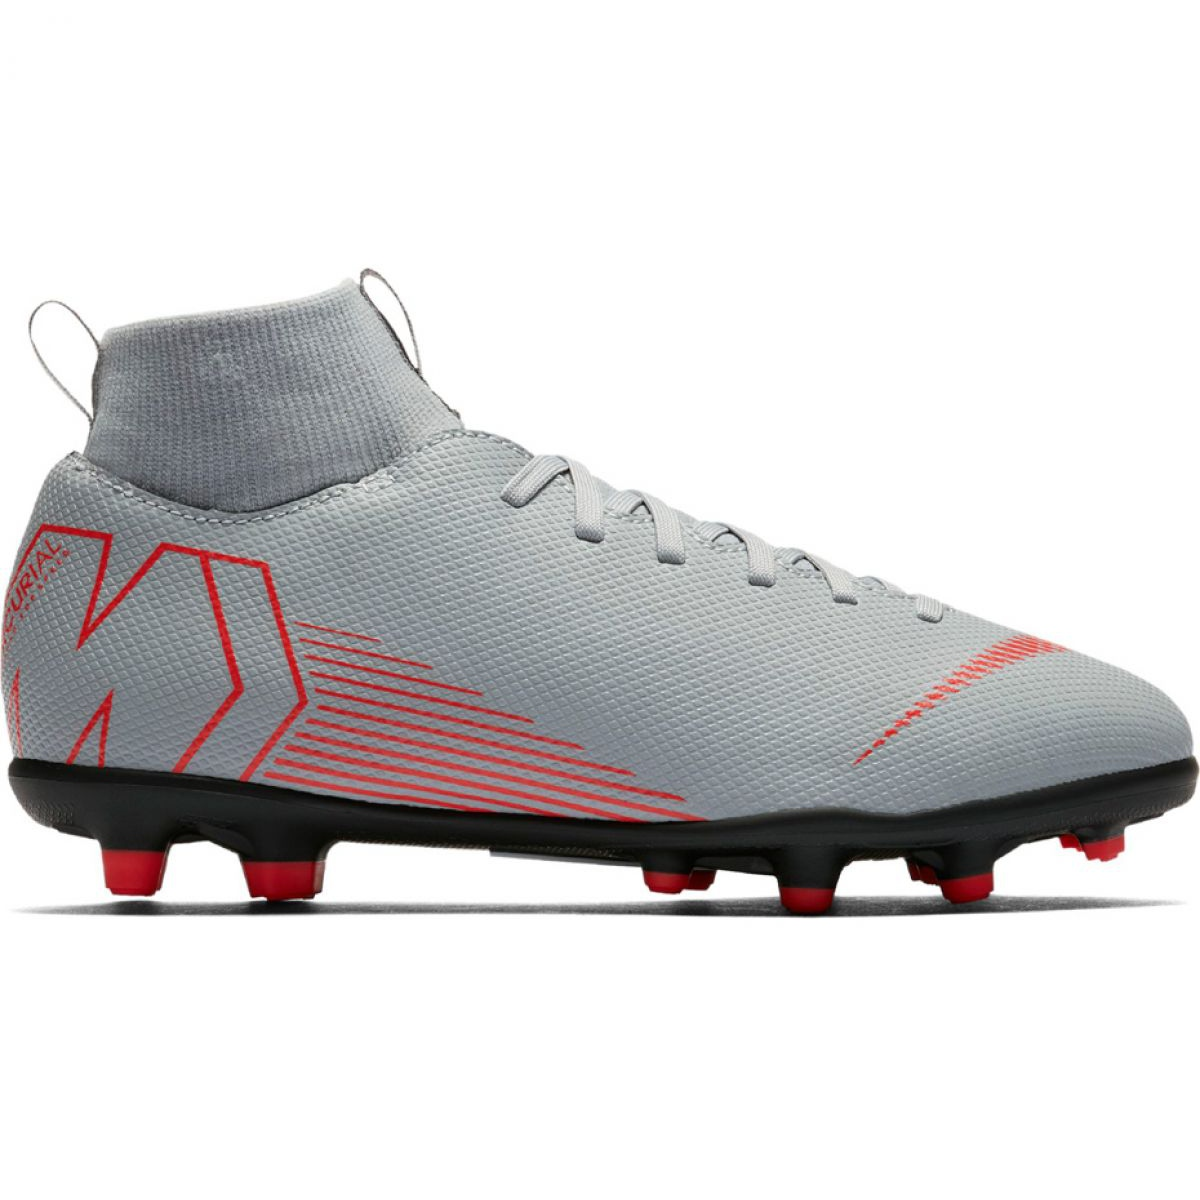 timeless design 36502 f8f1c Football shoes Nike Mercurial Superfly 6 Club Mg Jr AH7339 060 white